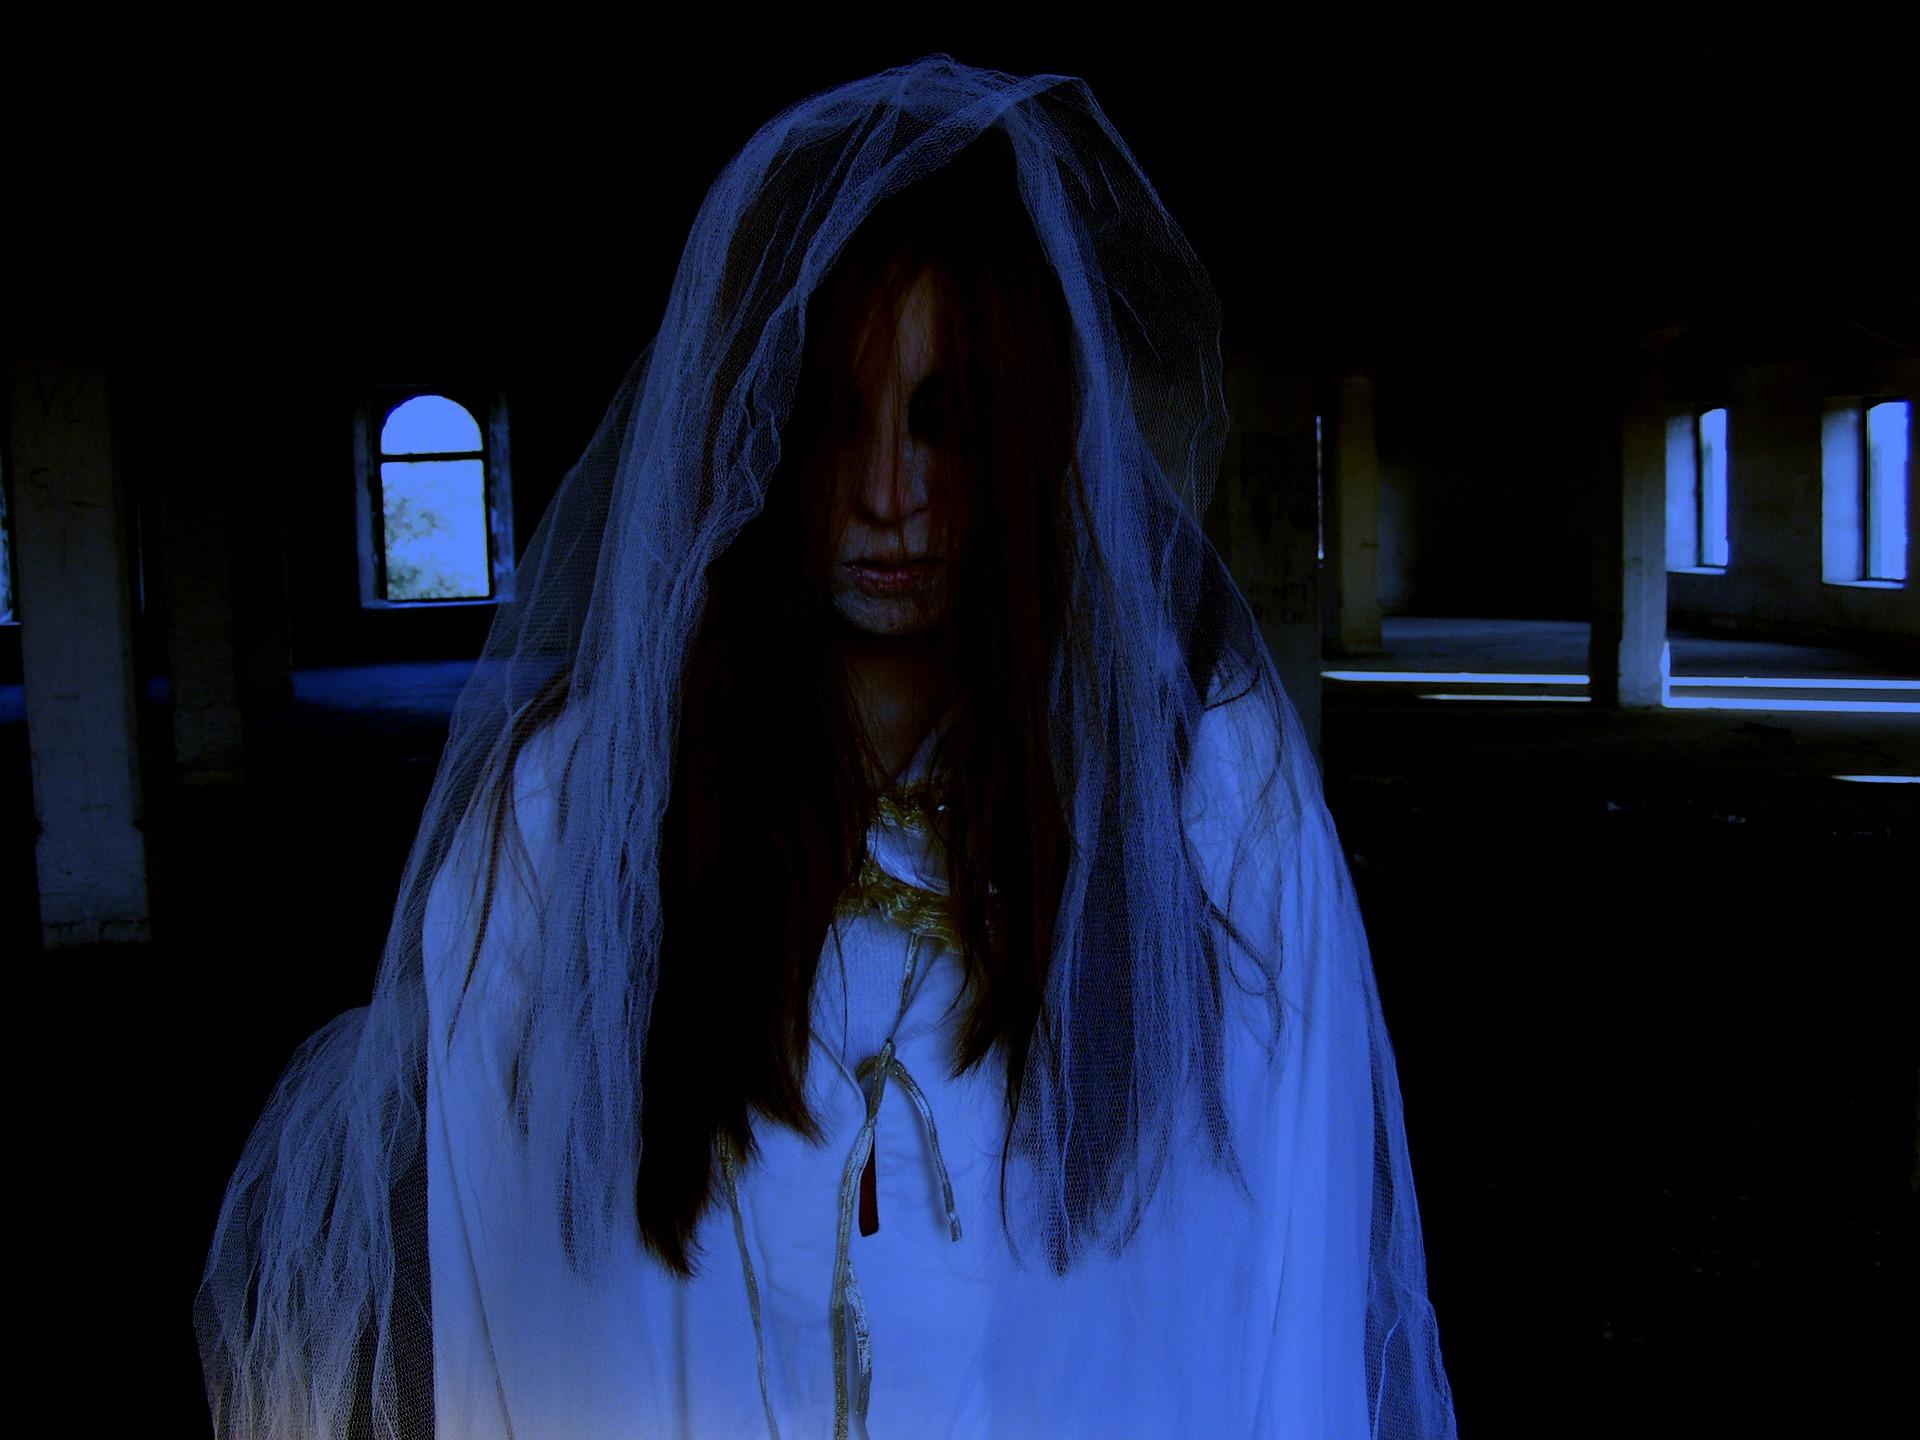 le-ghosting-feminin